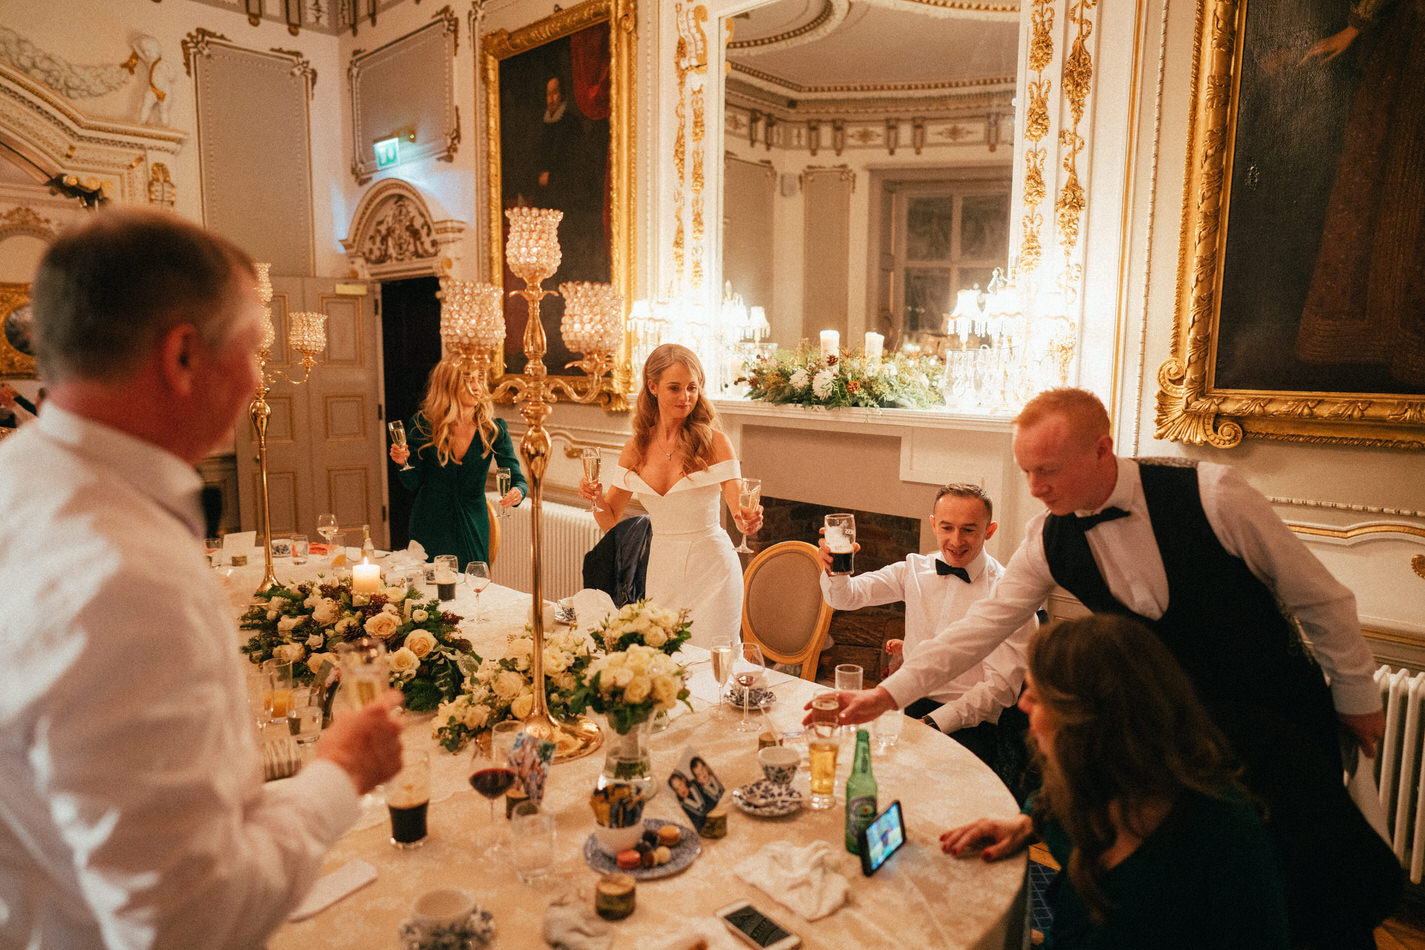 Castle-wedding-ireland-photos- 0308 227